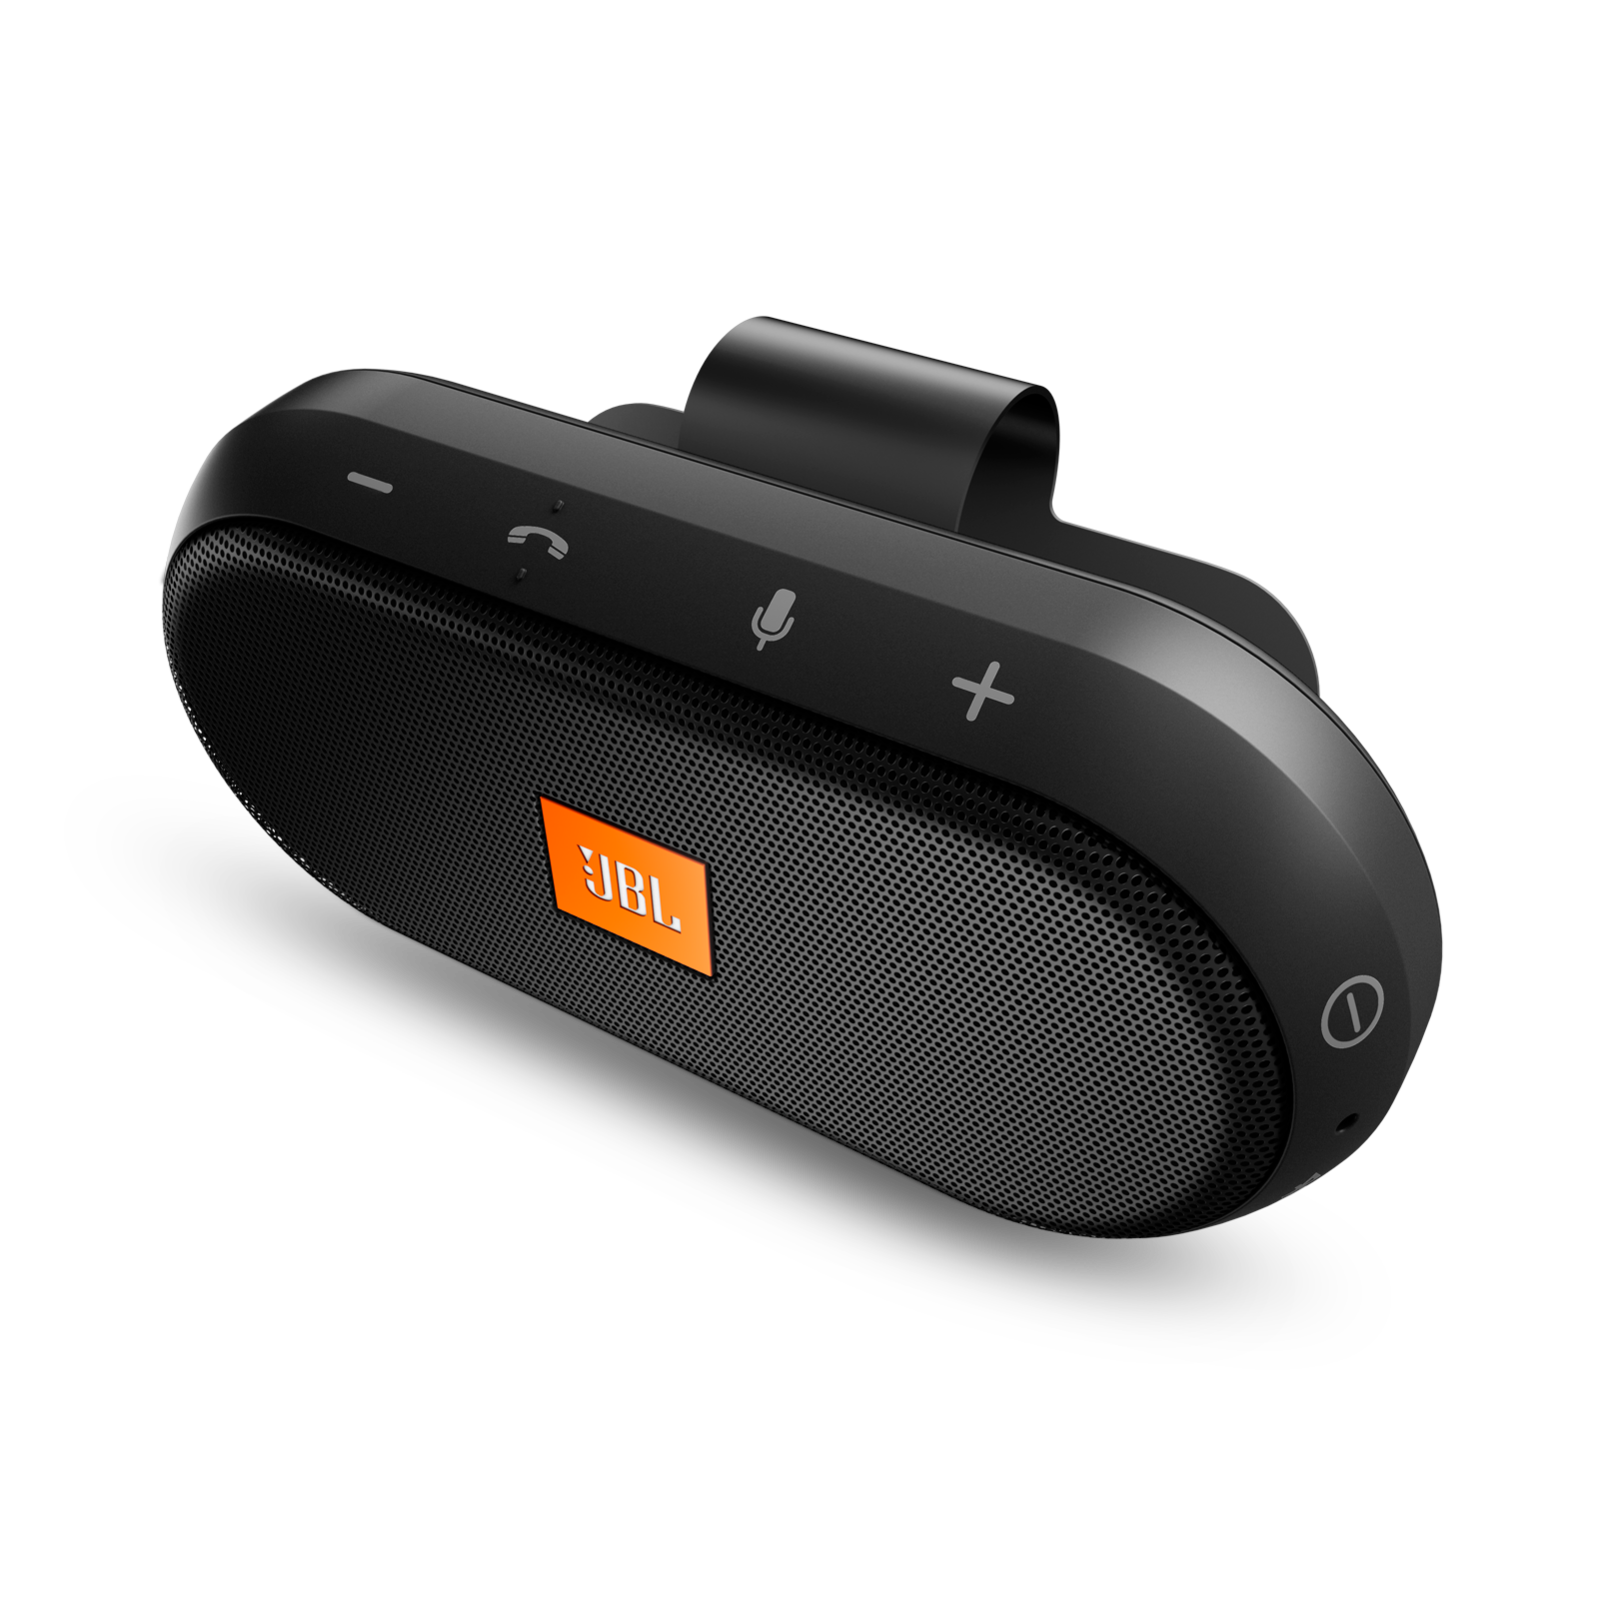 jbl trip visor mount portable bluetooth speaker